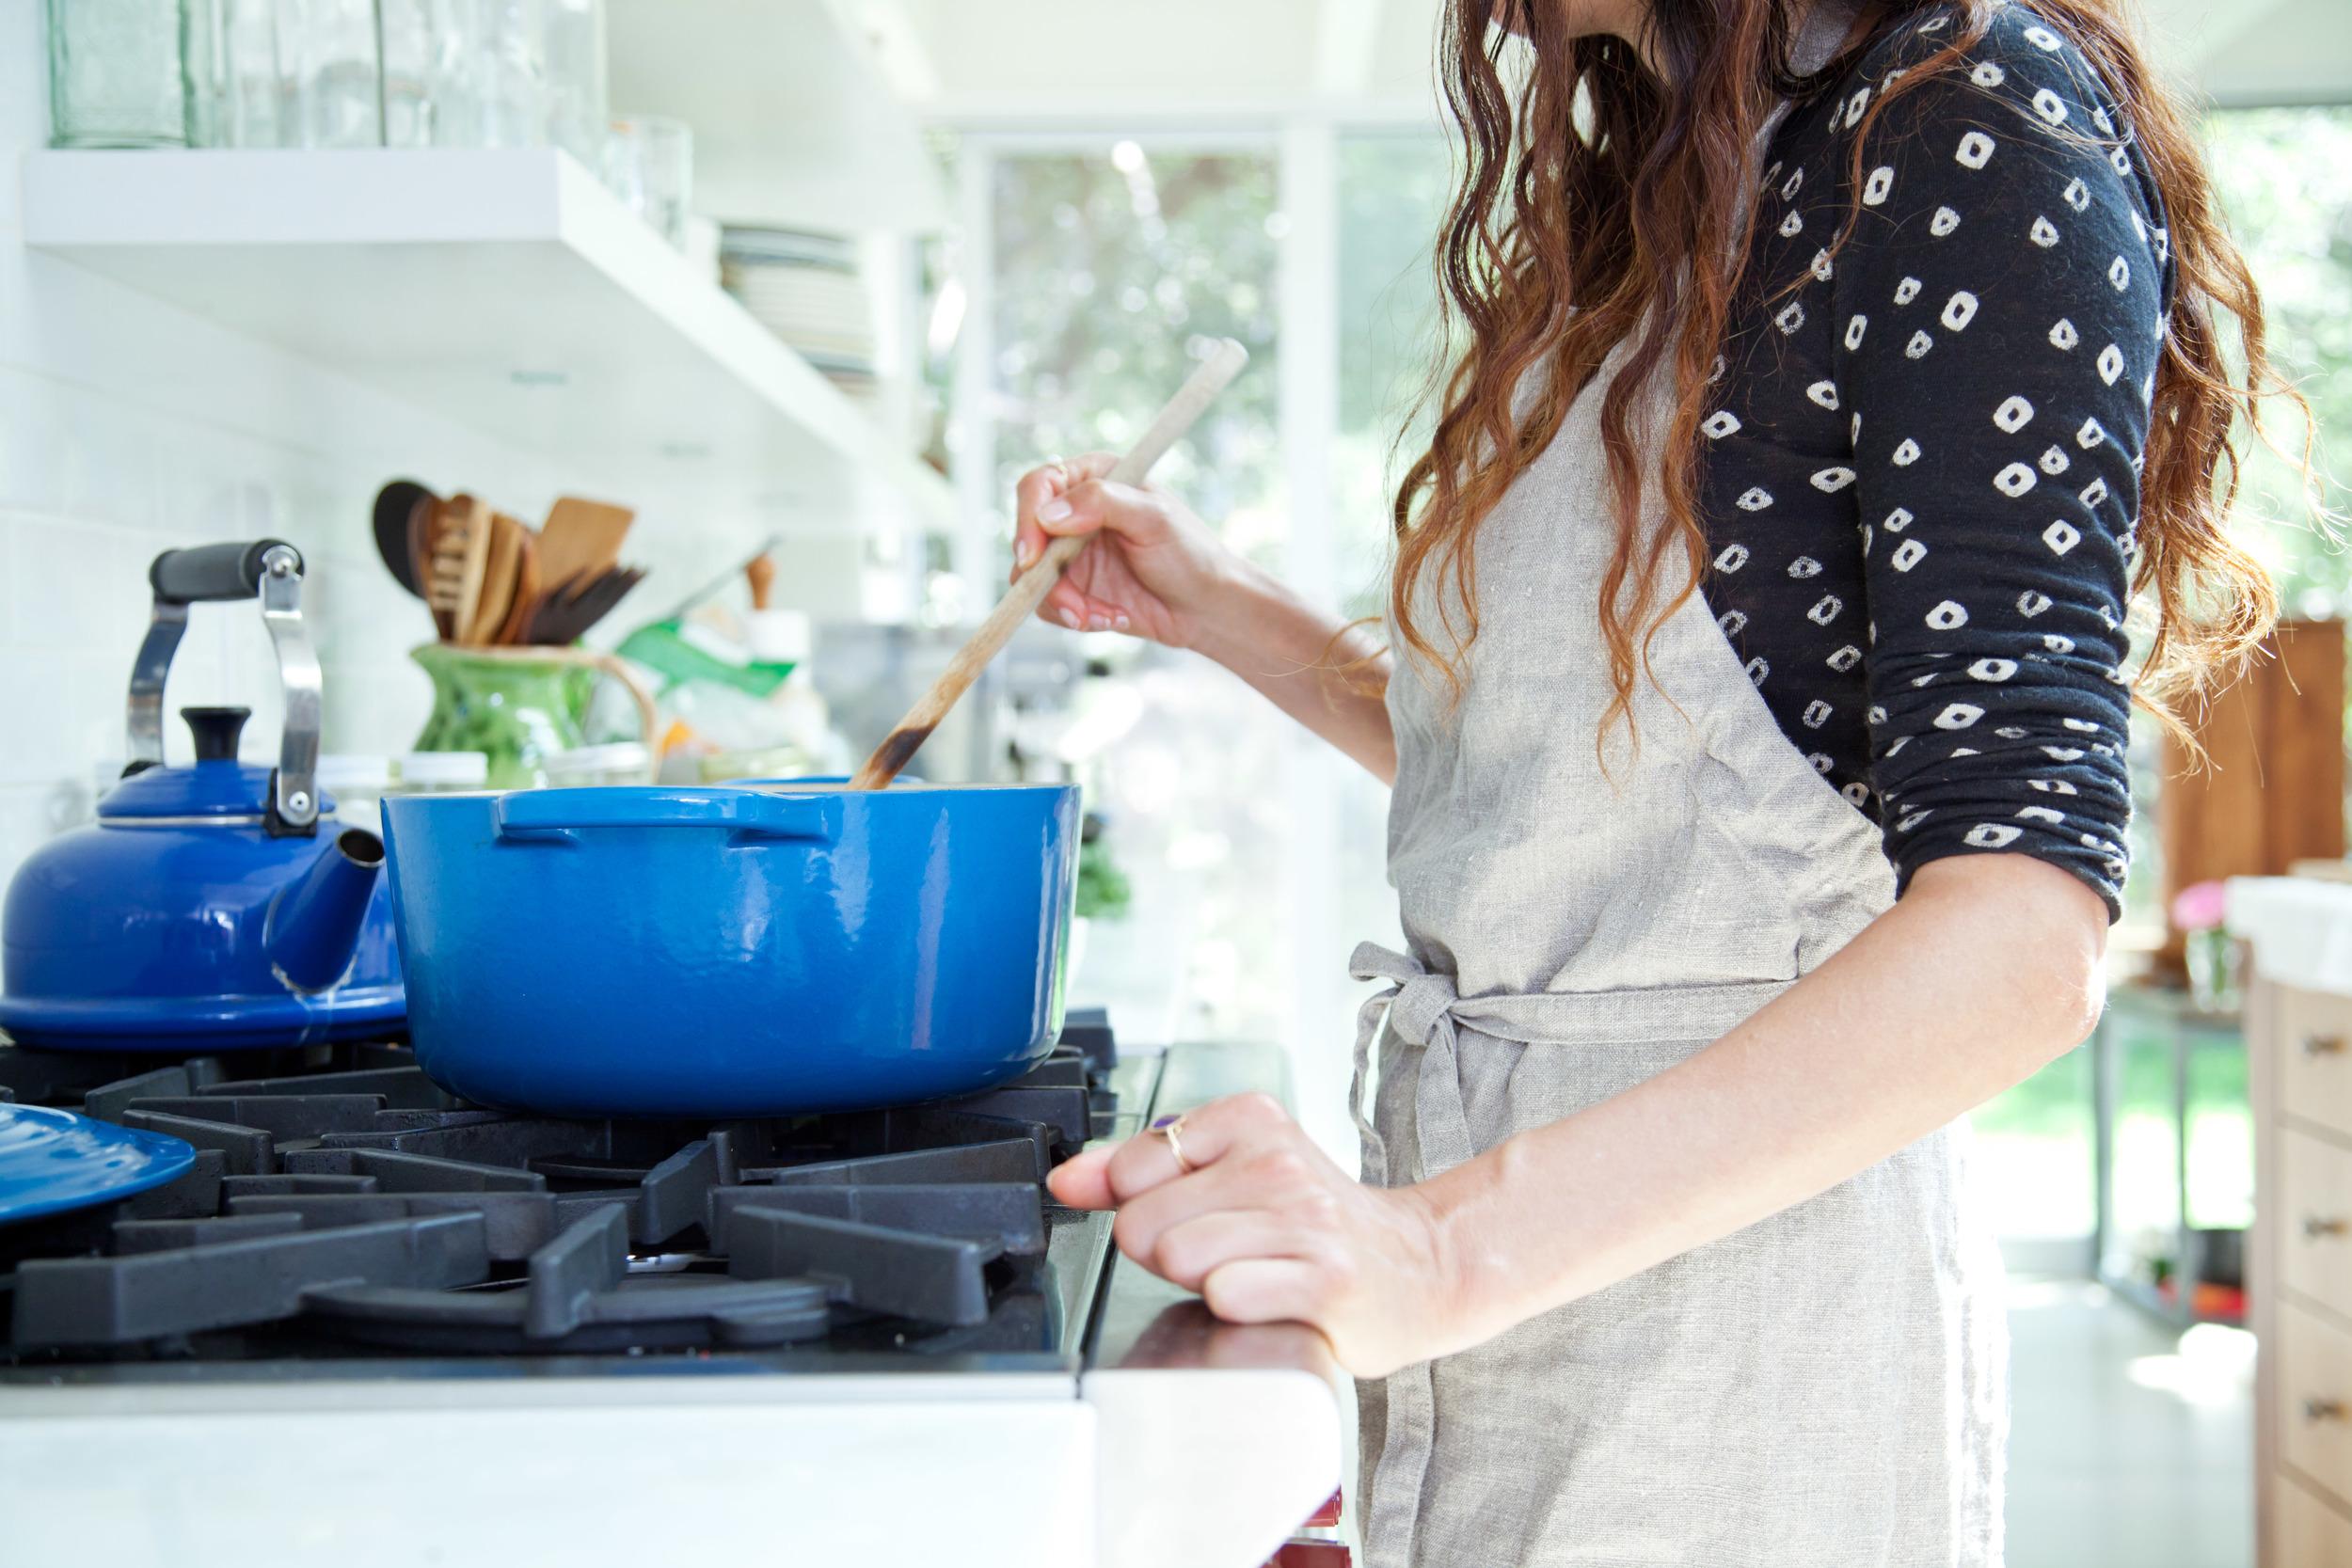 Shiva_Pamela_Cooking-23.jpg